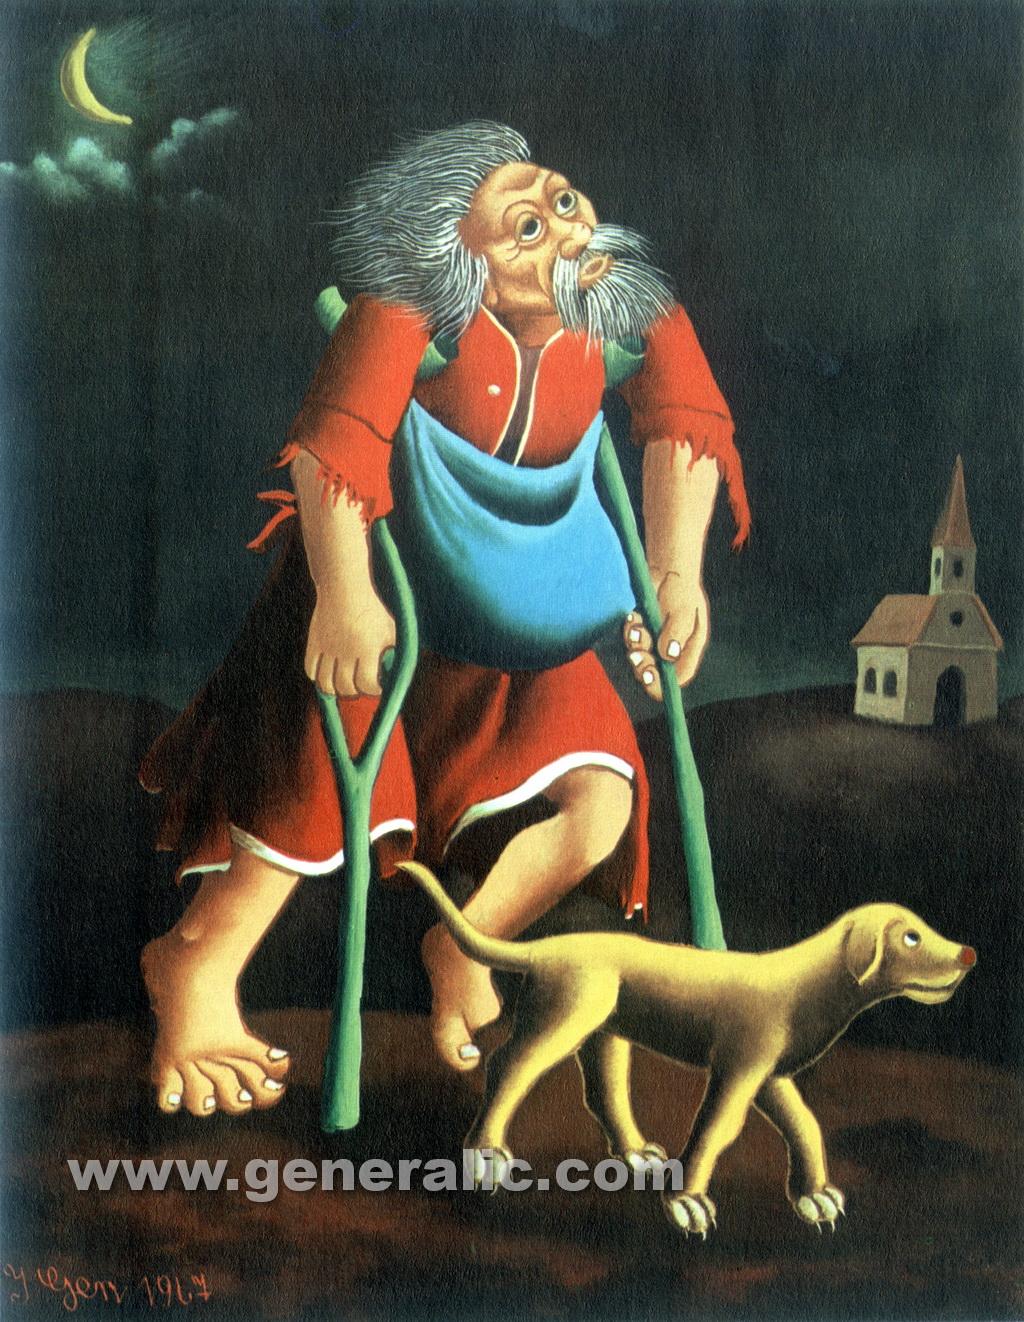 Ivan Generalic, 1967, Beggar on crutches, oil on glass